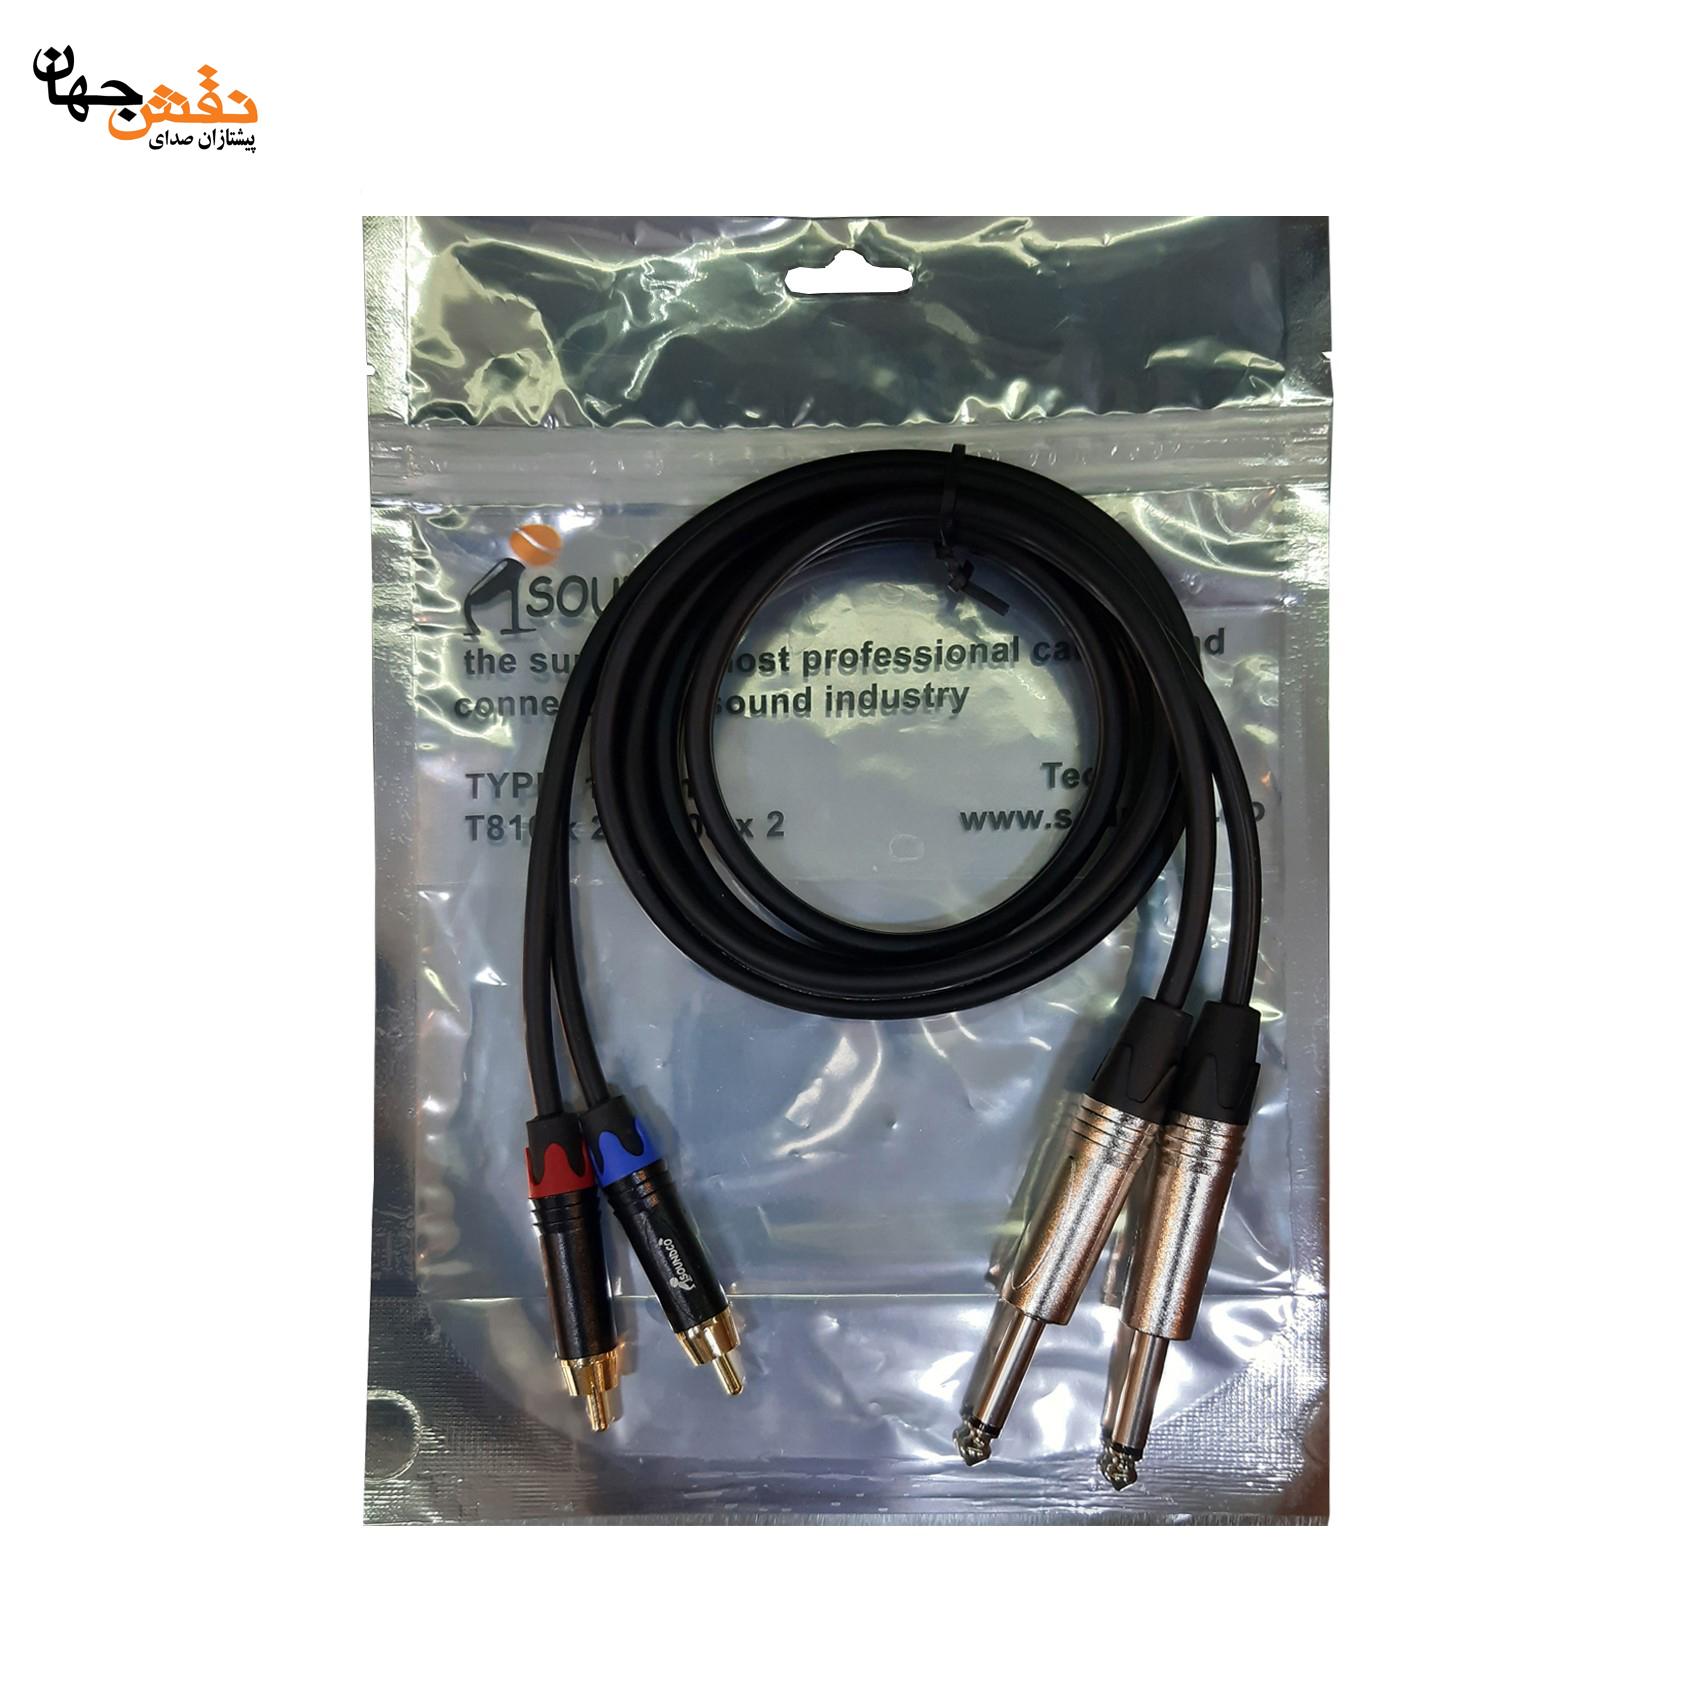 T810-T605 soundco.ir-2